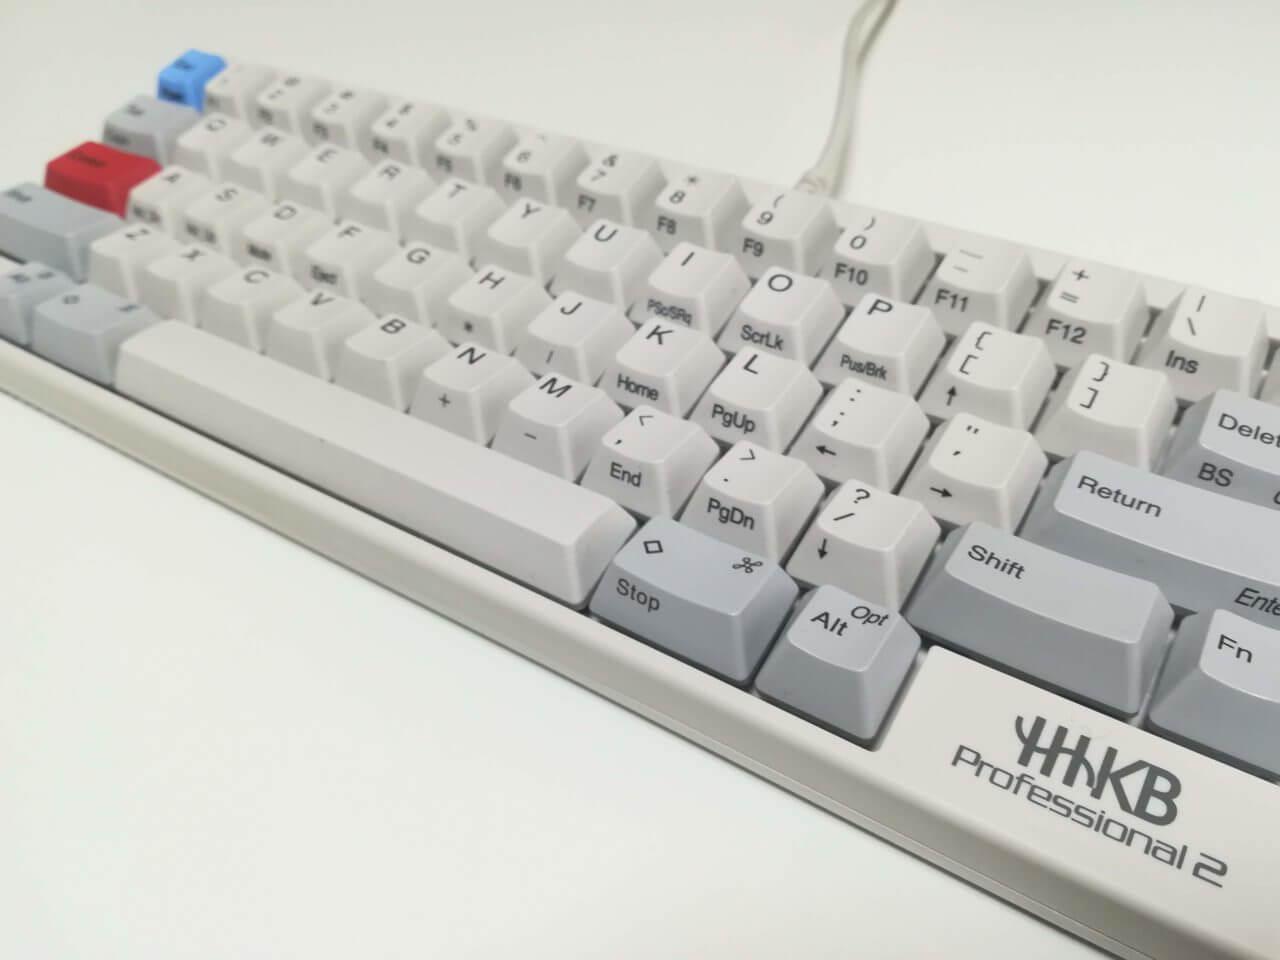 Happy Hacking Keyboard Professional2 Type-S 英語配列